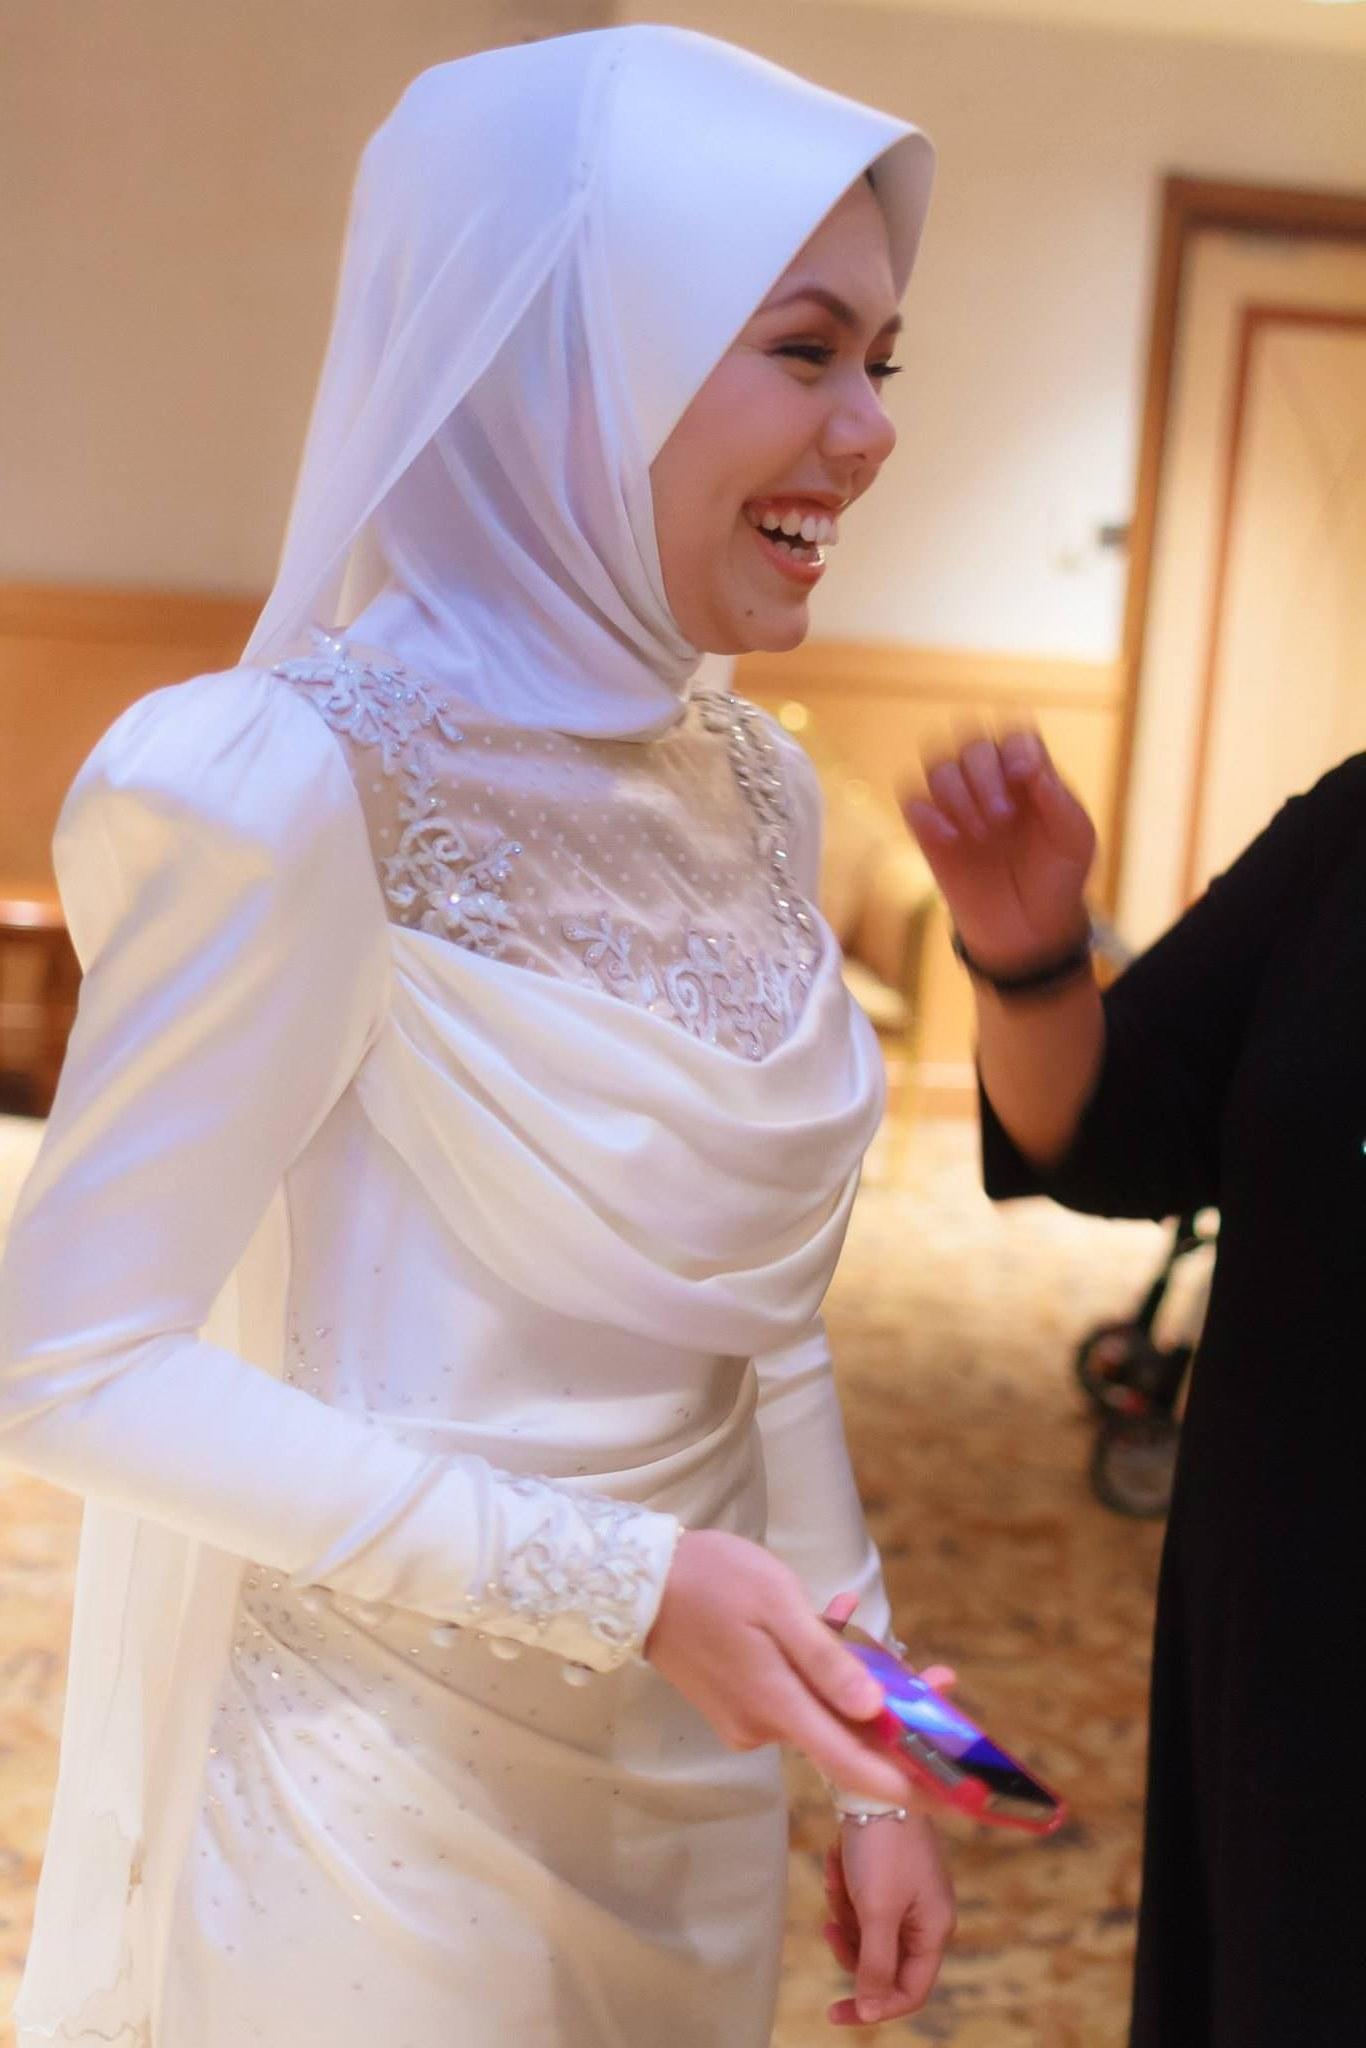 Bentuk Baju Pengantin Muslimah Online Wddj Baju Pengantin Moden Baju Pengantin songket by Melinda